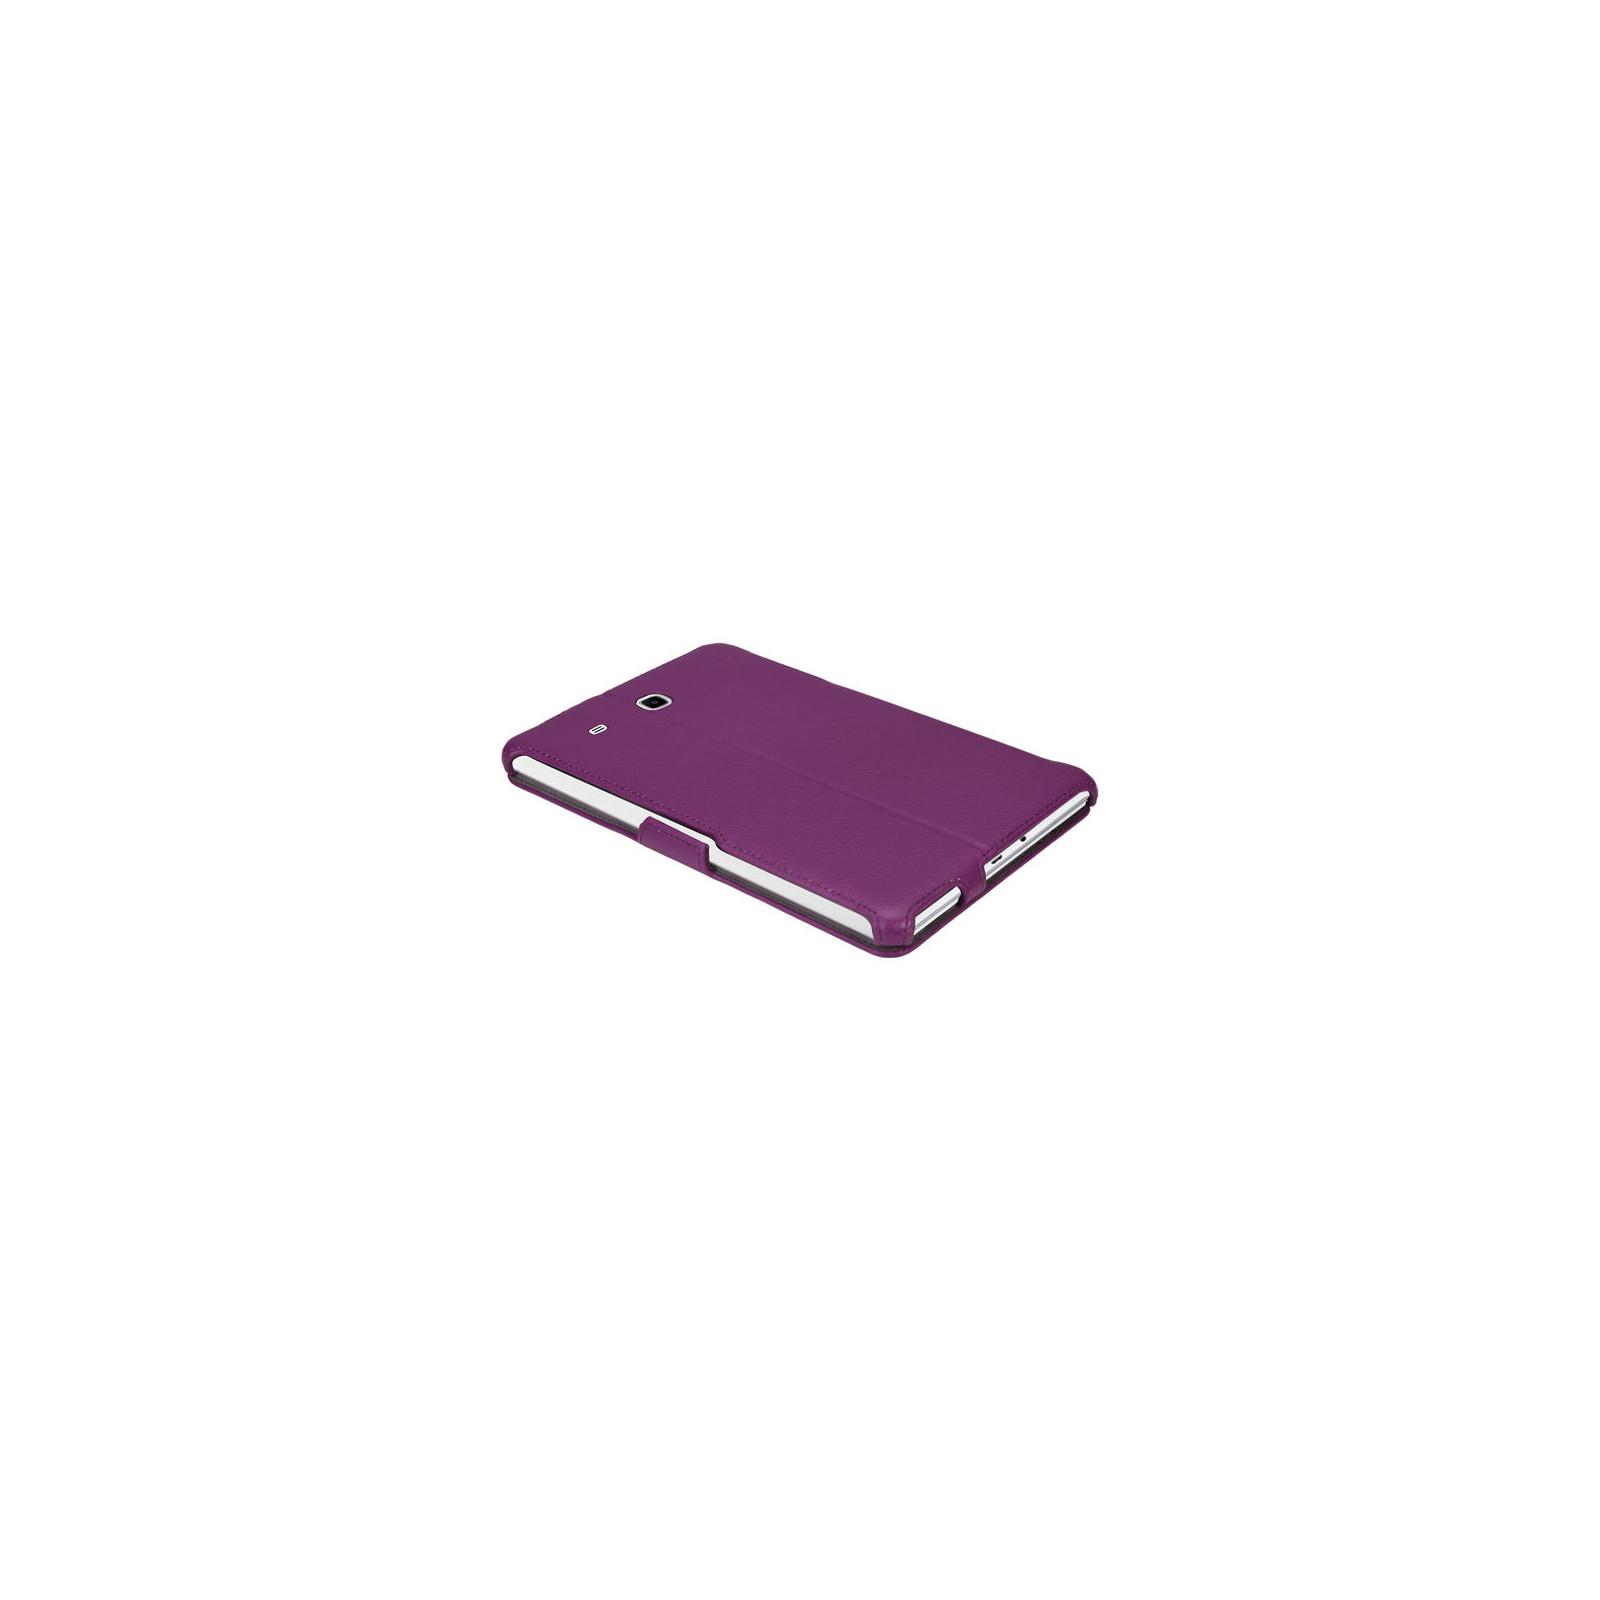 Чехол для планшета AirOn для Samsung Galaxy Tab E 9.6 vio (4822352776329) изображение 4